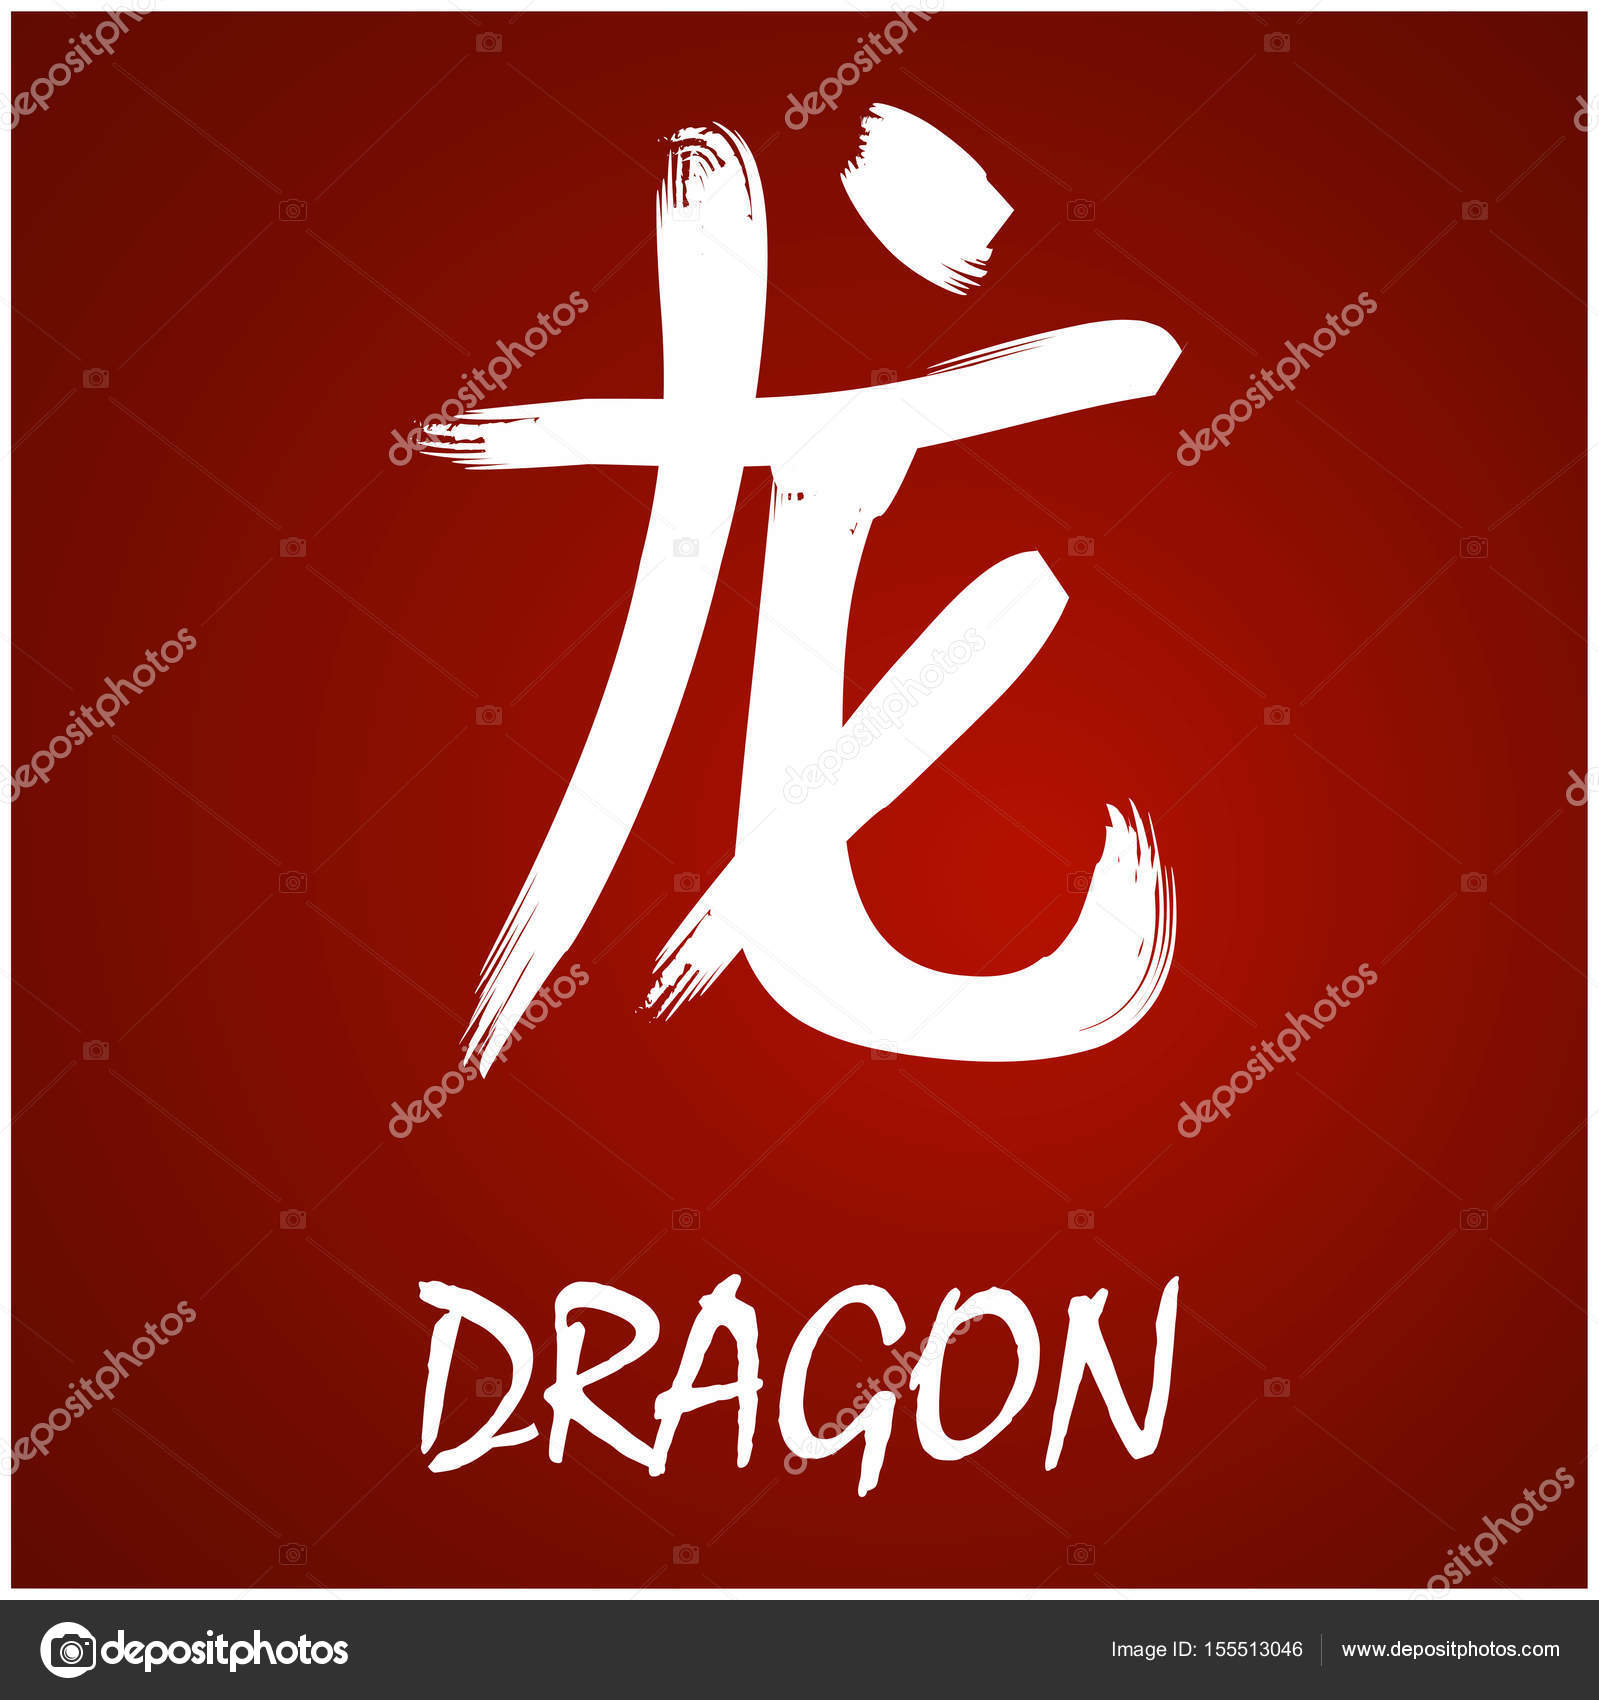 Japanese symbol dragon images symbol and sign ideas japanese kanji dragon stock vector tillhunter 155513046 japanese kanji dragon stock vector 155513046 buycottarizona buycottarizona